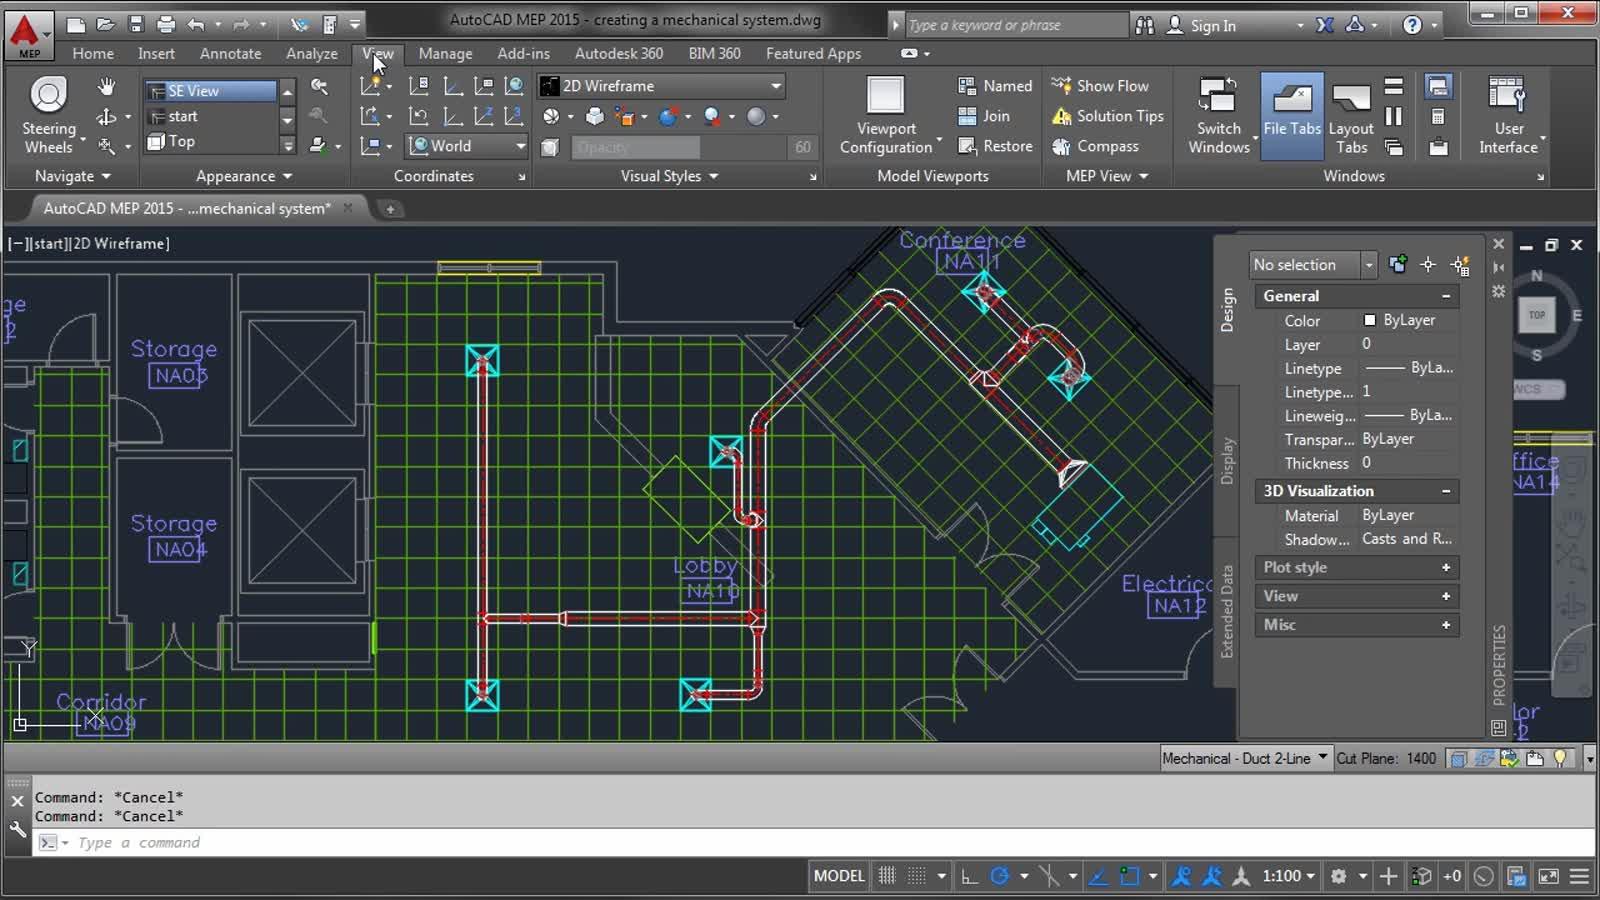 AutoCAD MEP - Creating a Mechanical System   AutoCAD MEP   Autodesk